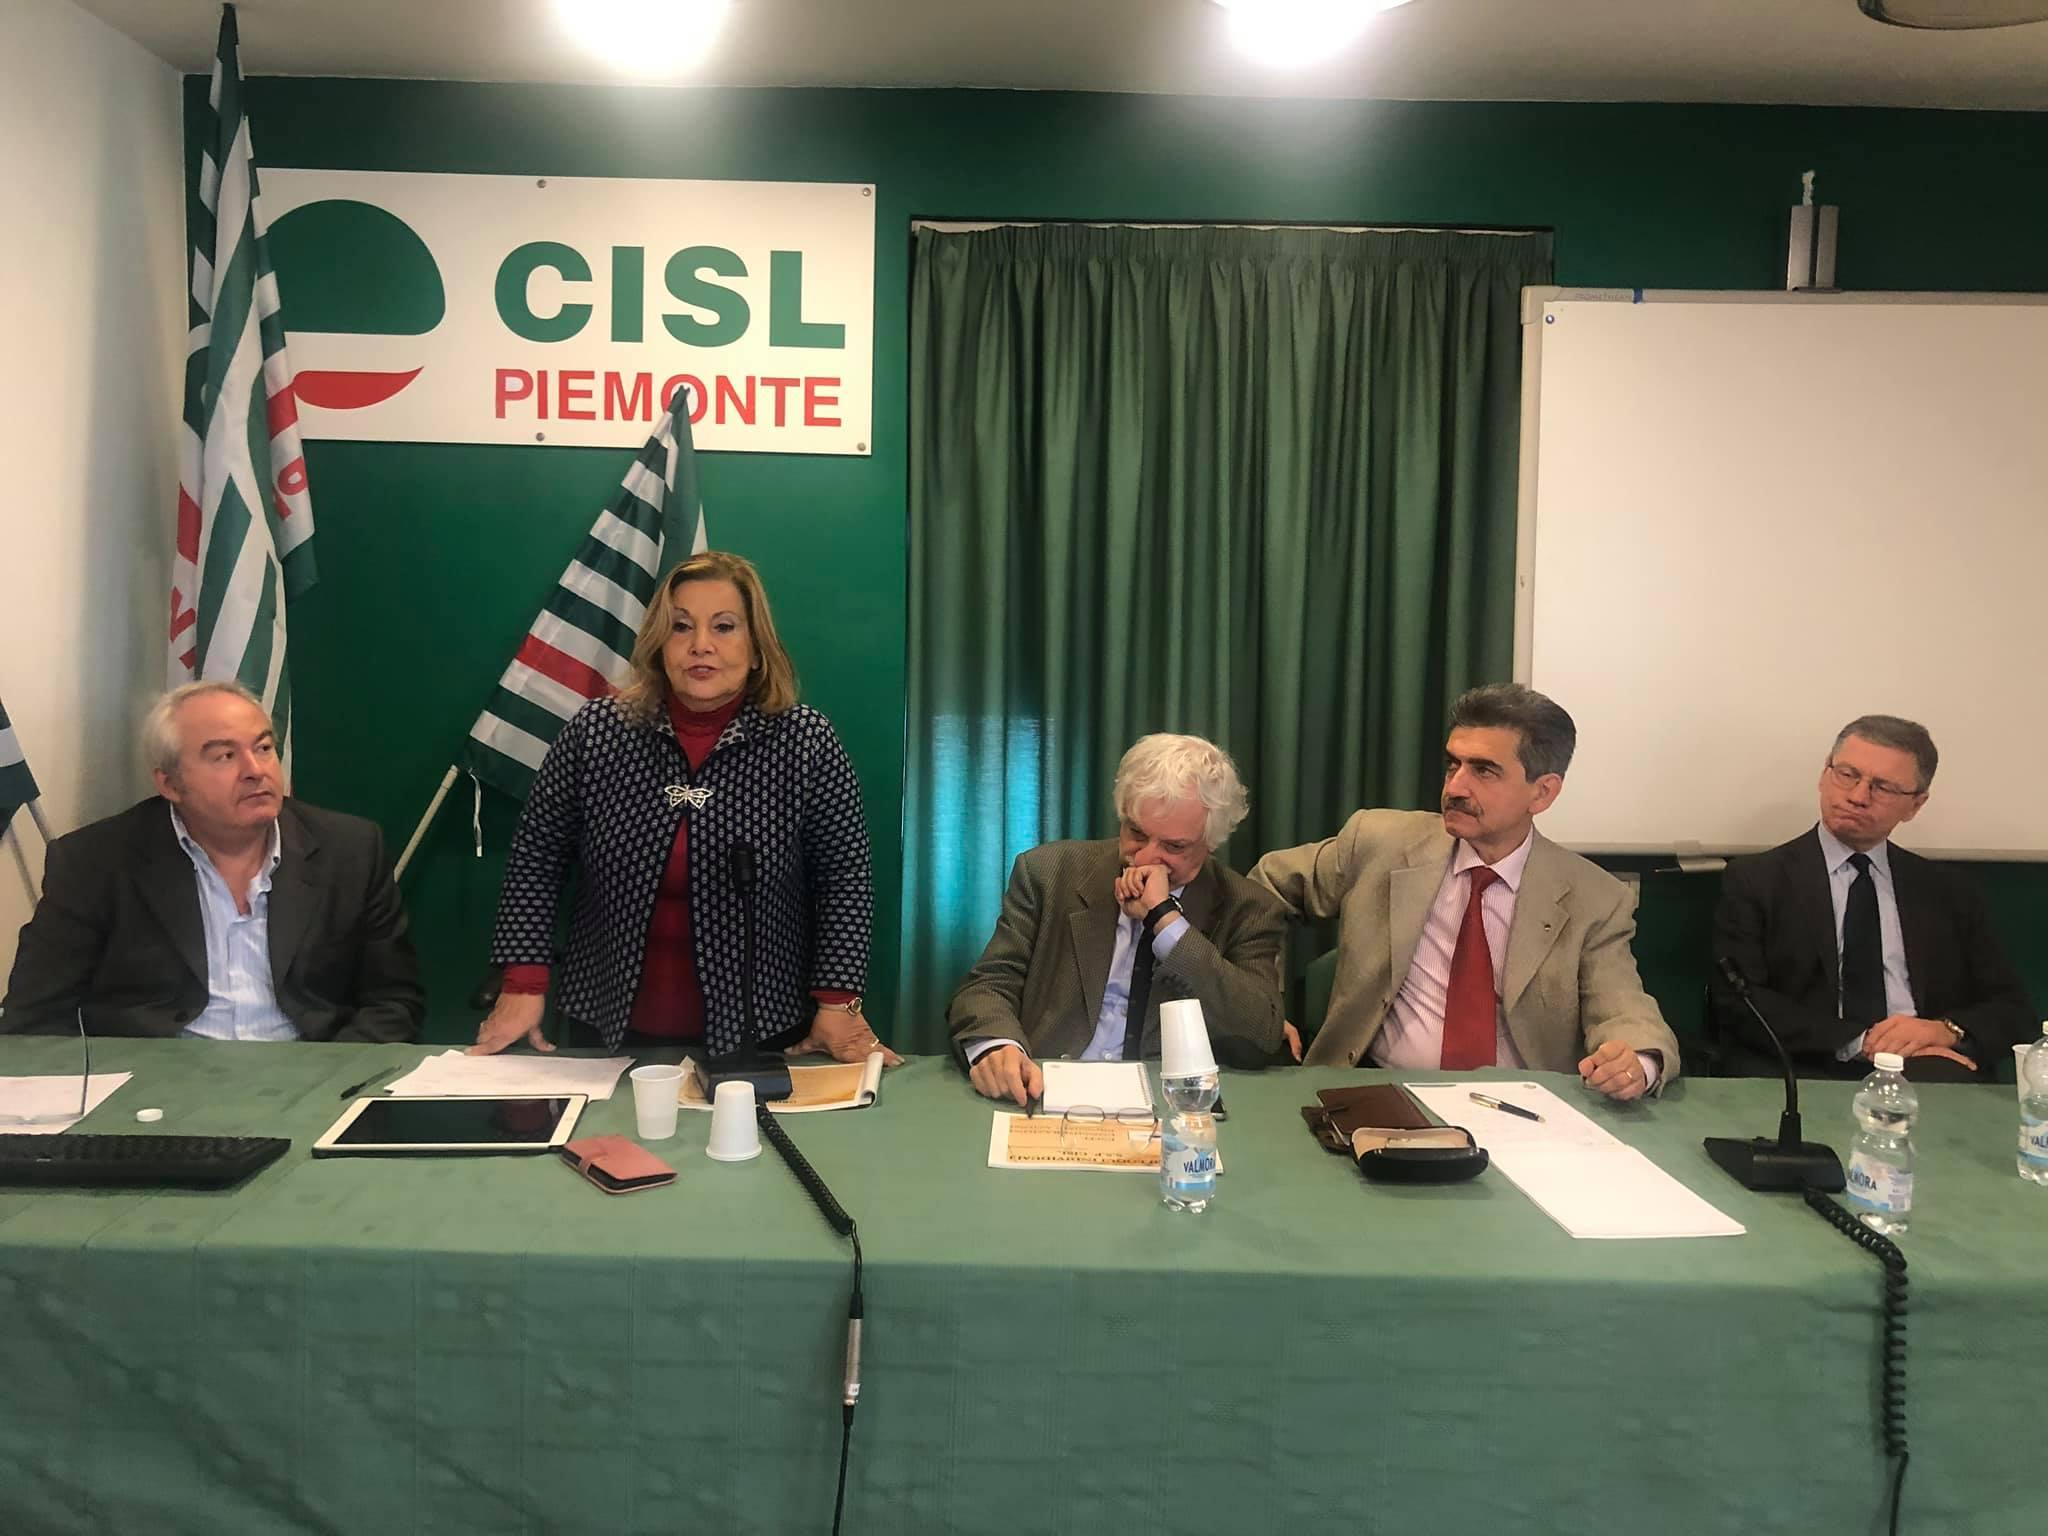 Caf Cisl riunione a Torino